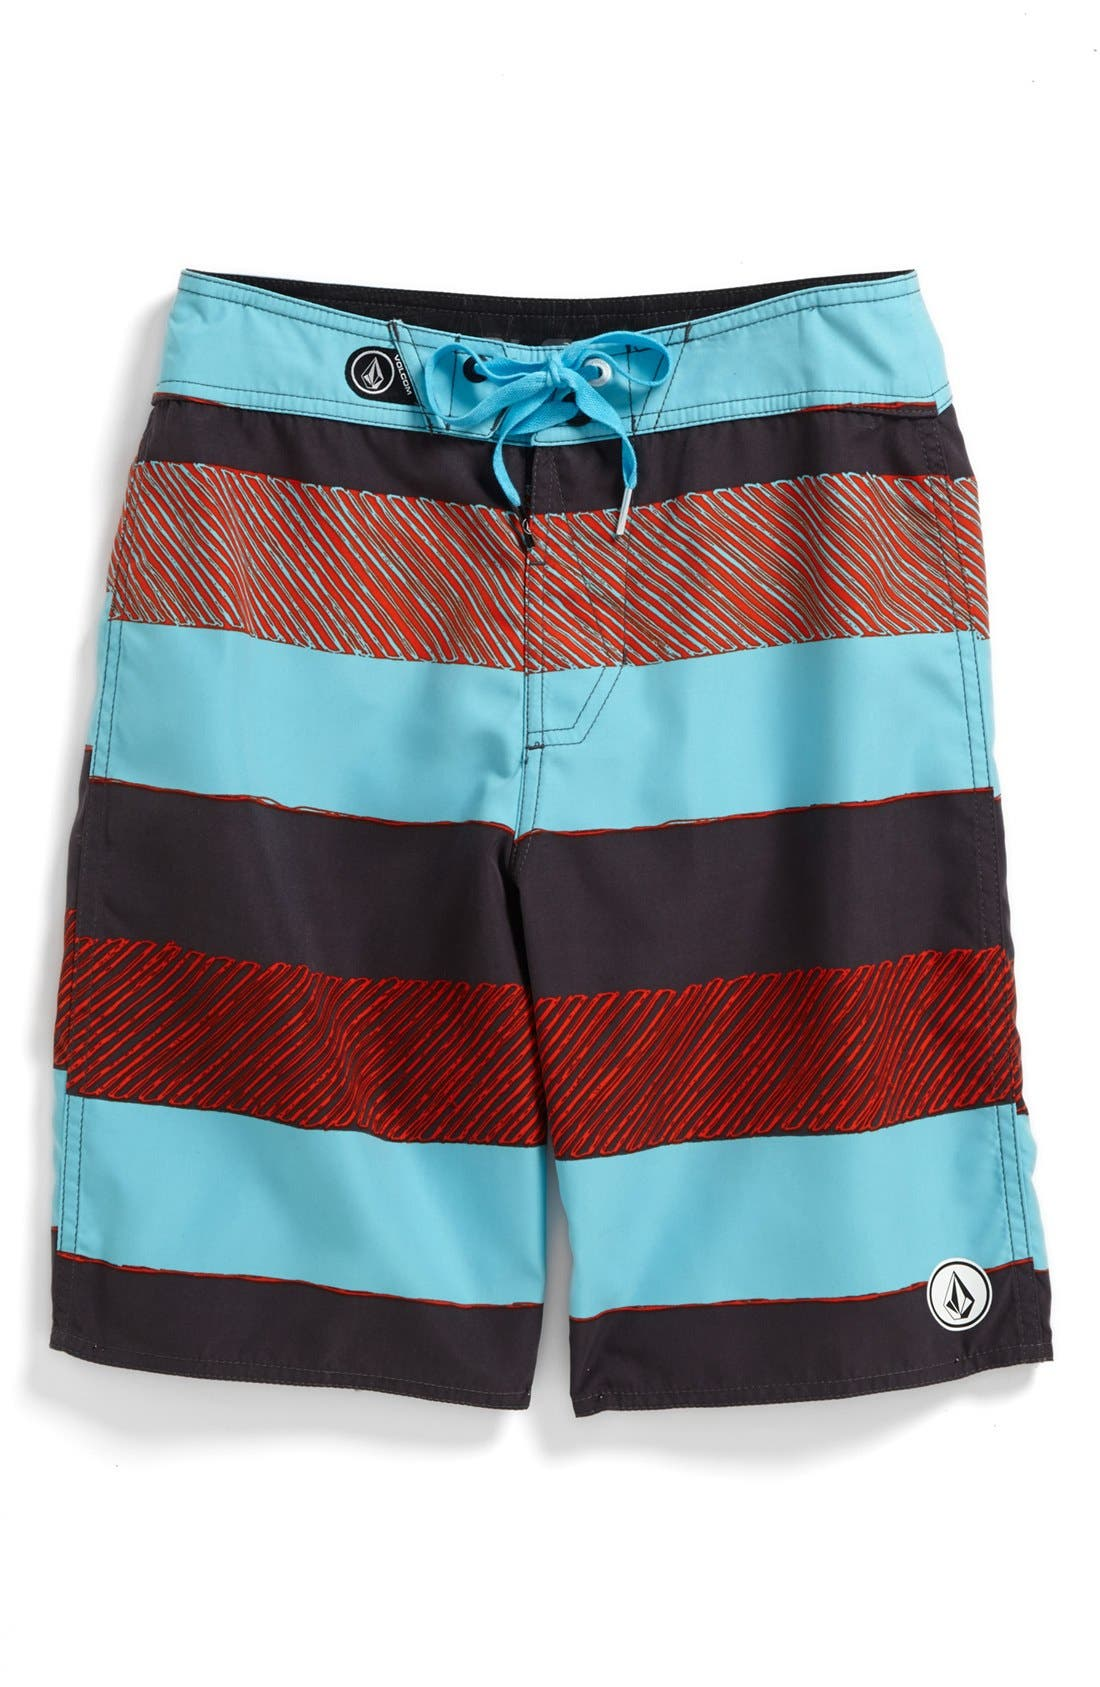 Alternate Image 1 Selected - Volcom 'De Soto St.' Board Shorts (Big Boys)